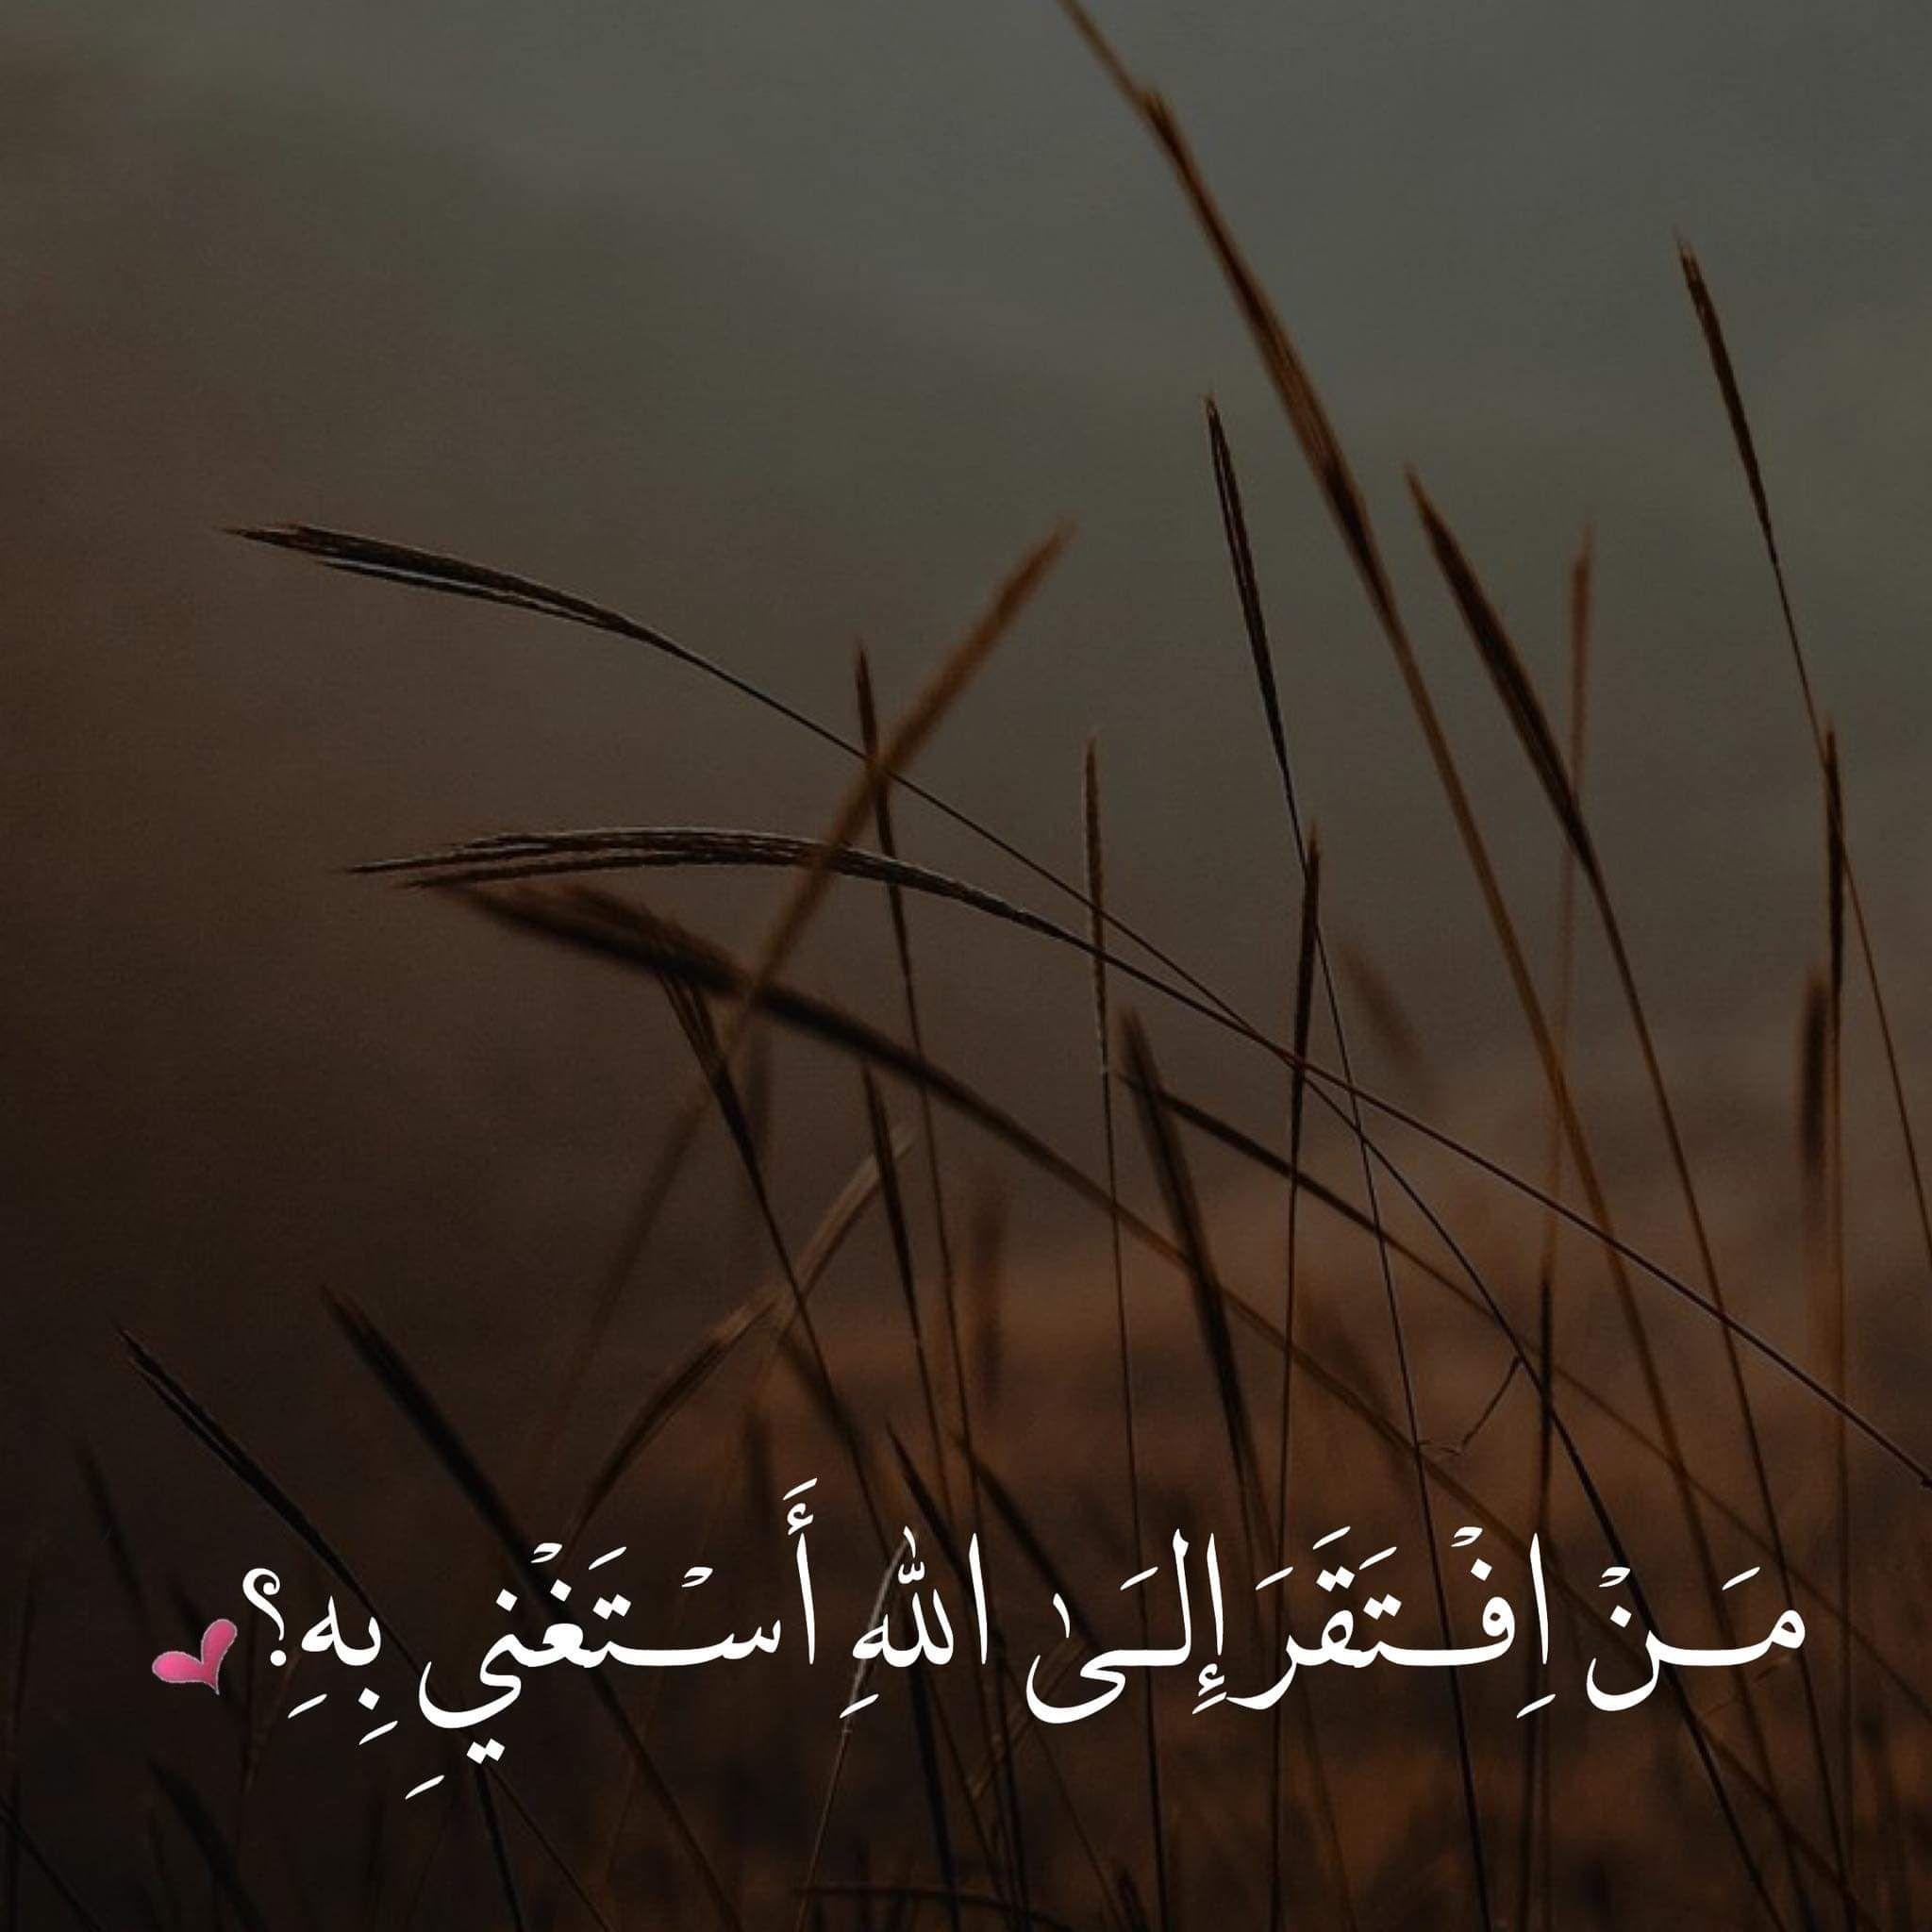 خواطر اسلامية تويتر Islamic Quotes Quotes Neon Signs